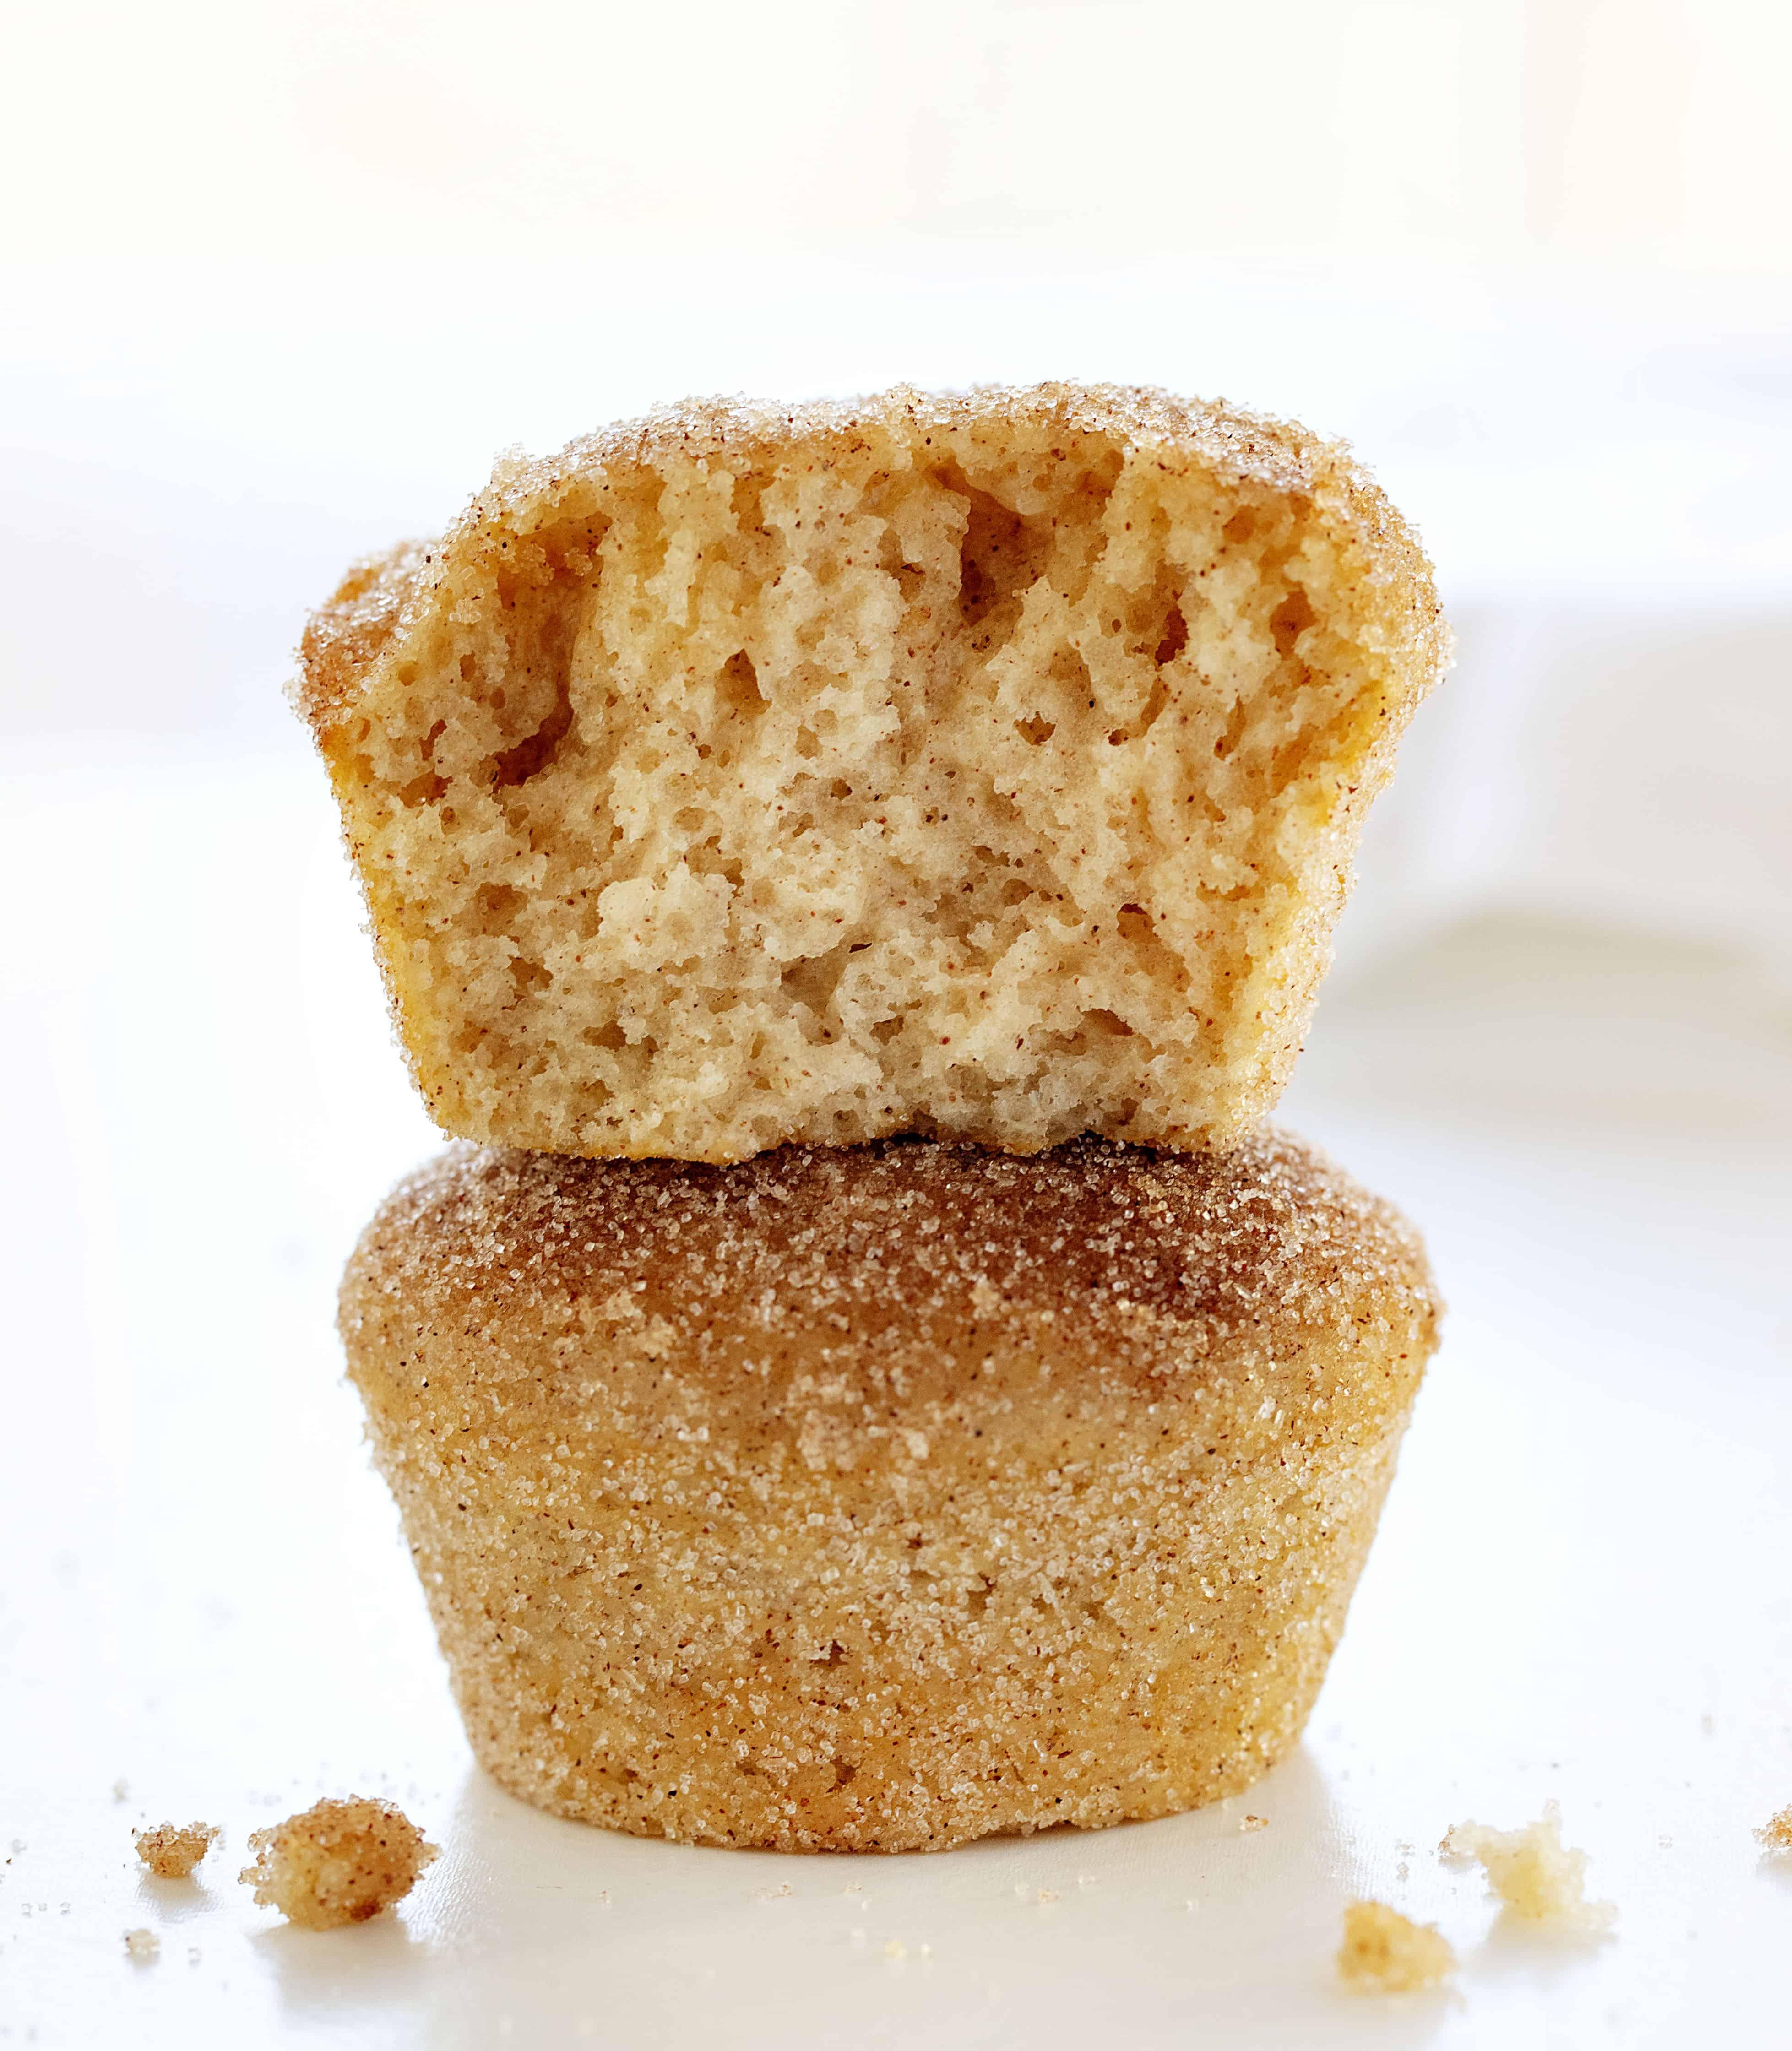 Cinnamon Sugar Donut Muffins Stacked